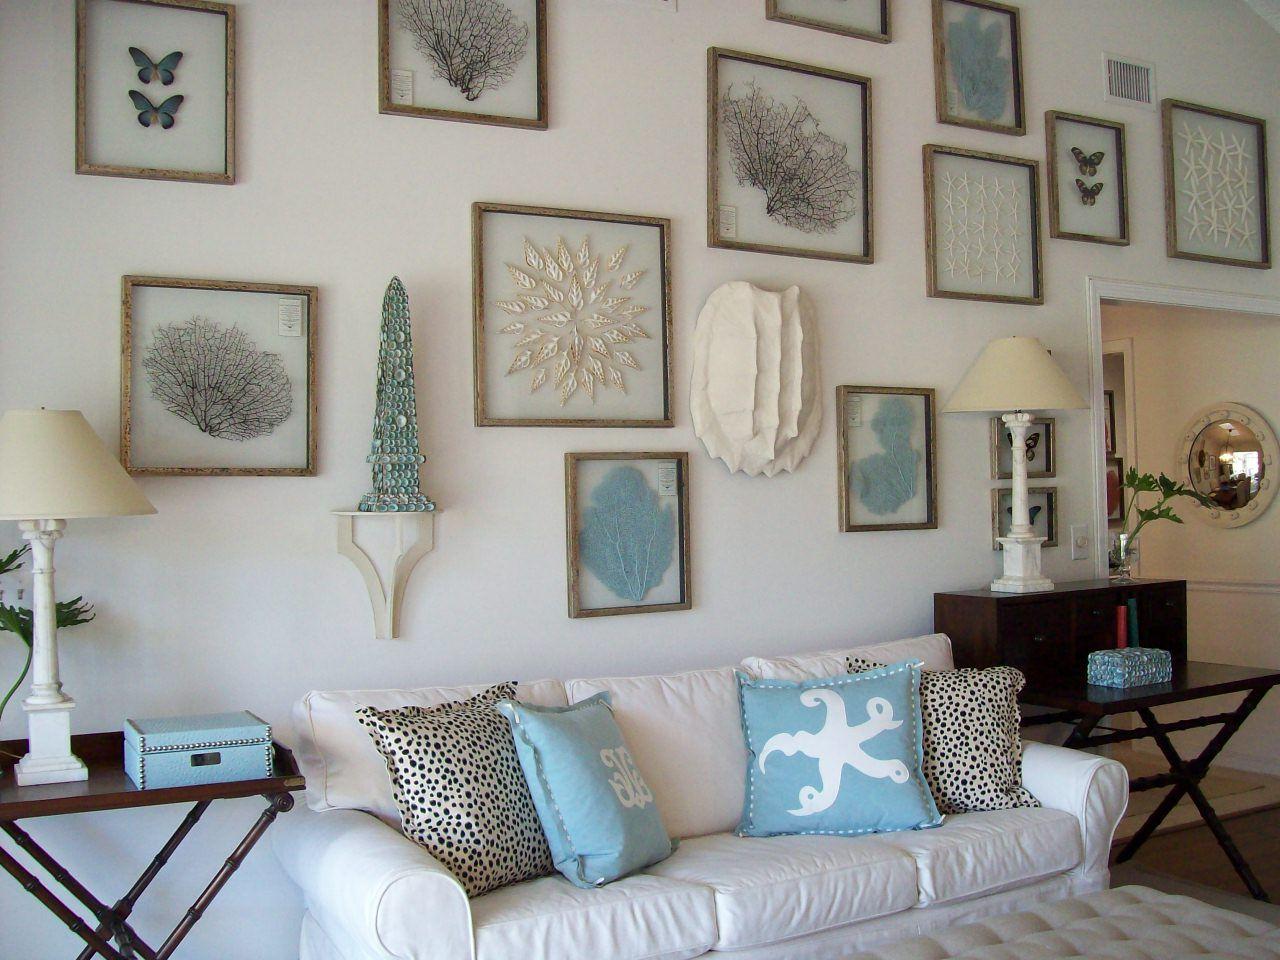 Coastal living small bathrooms - Modern Beach Themed Living Room Lavita Home Florida Decorating Ideas Home How To Decorate Decoration Beach